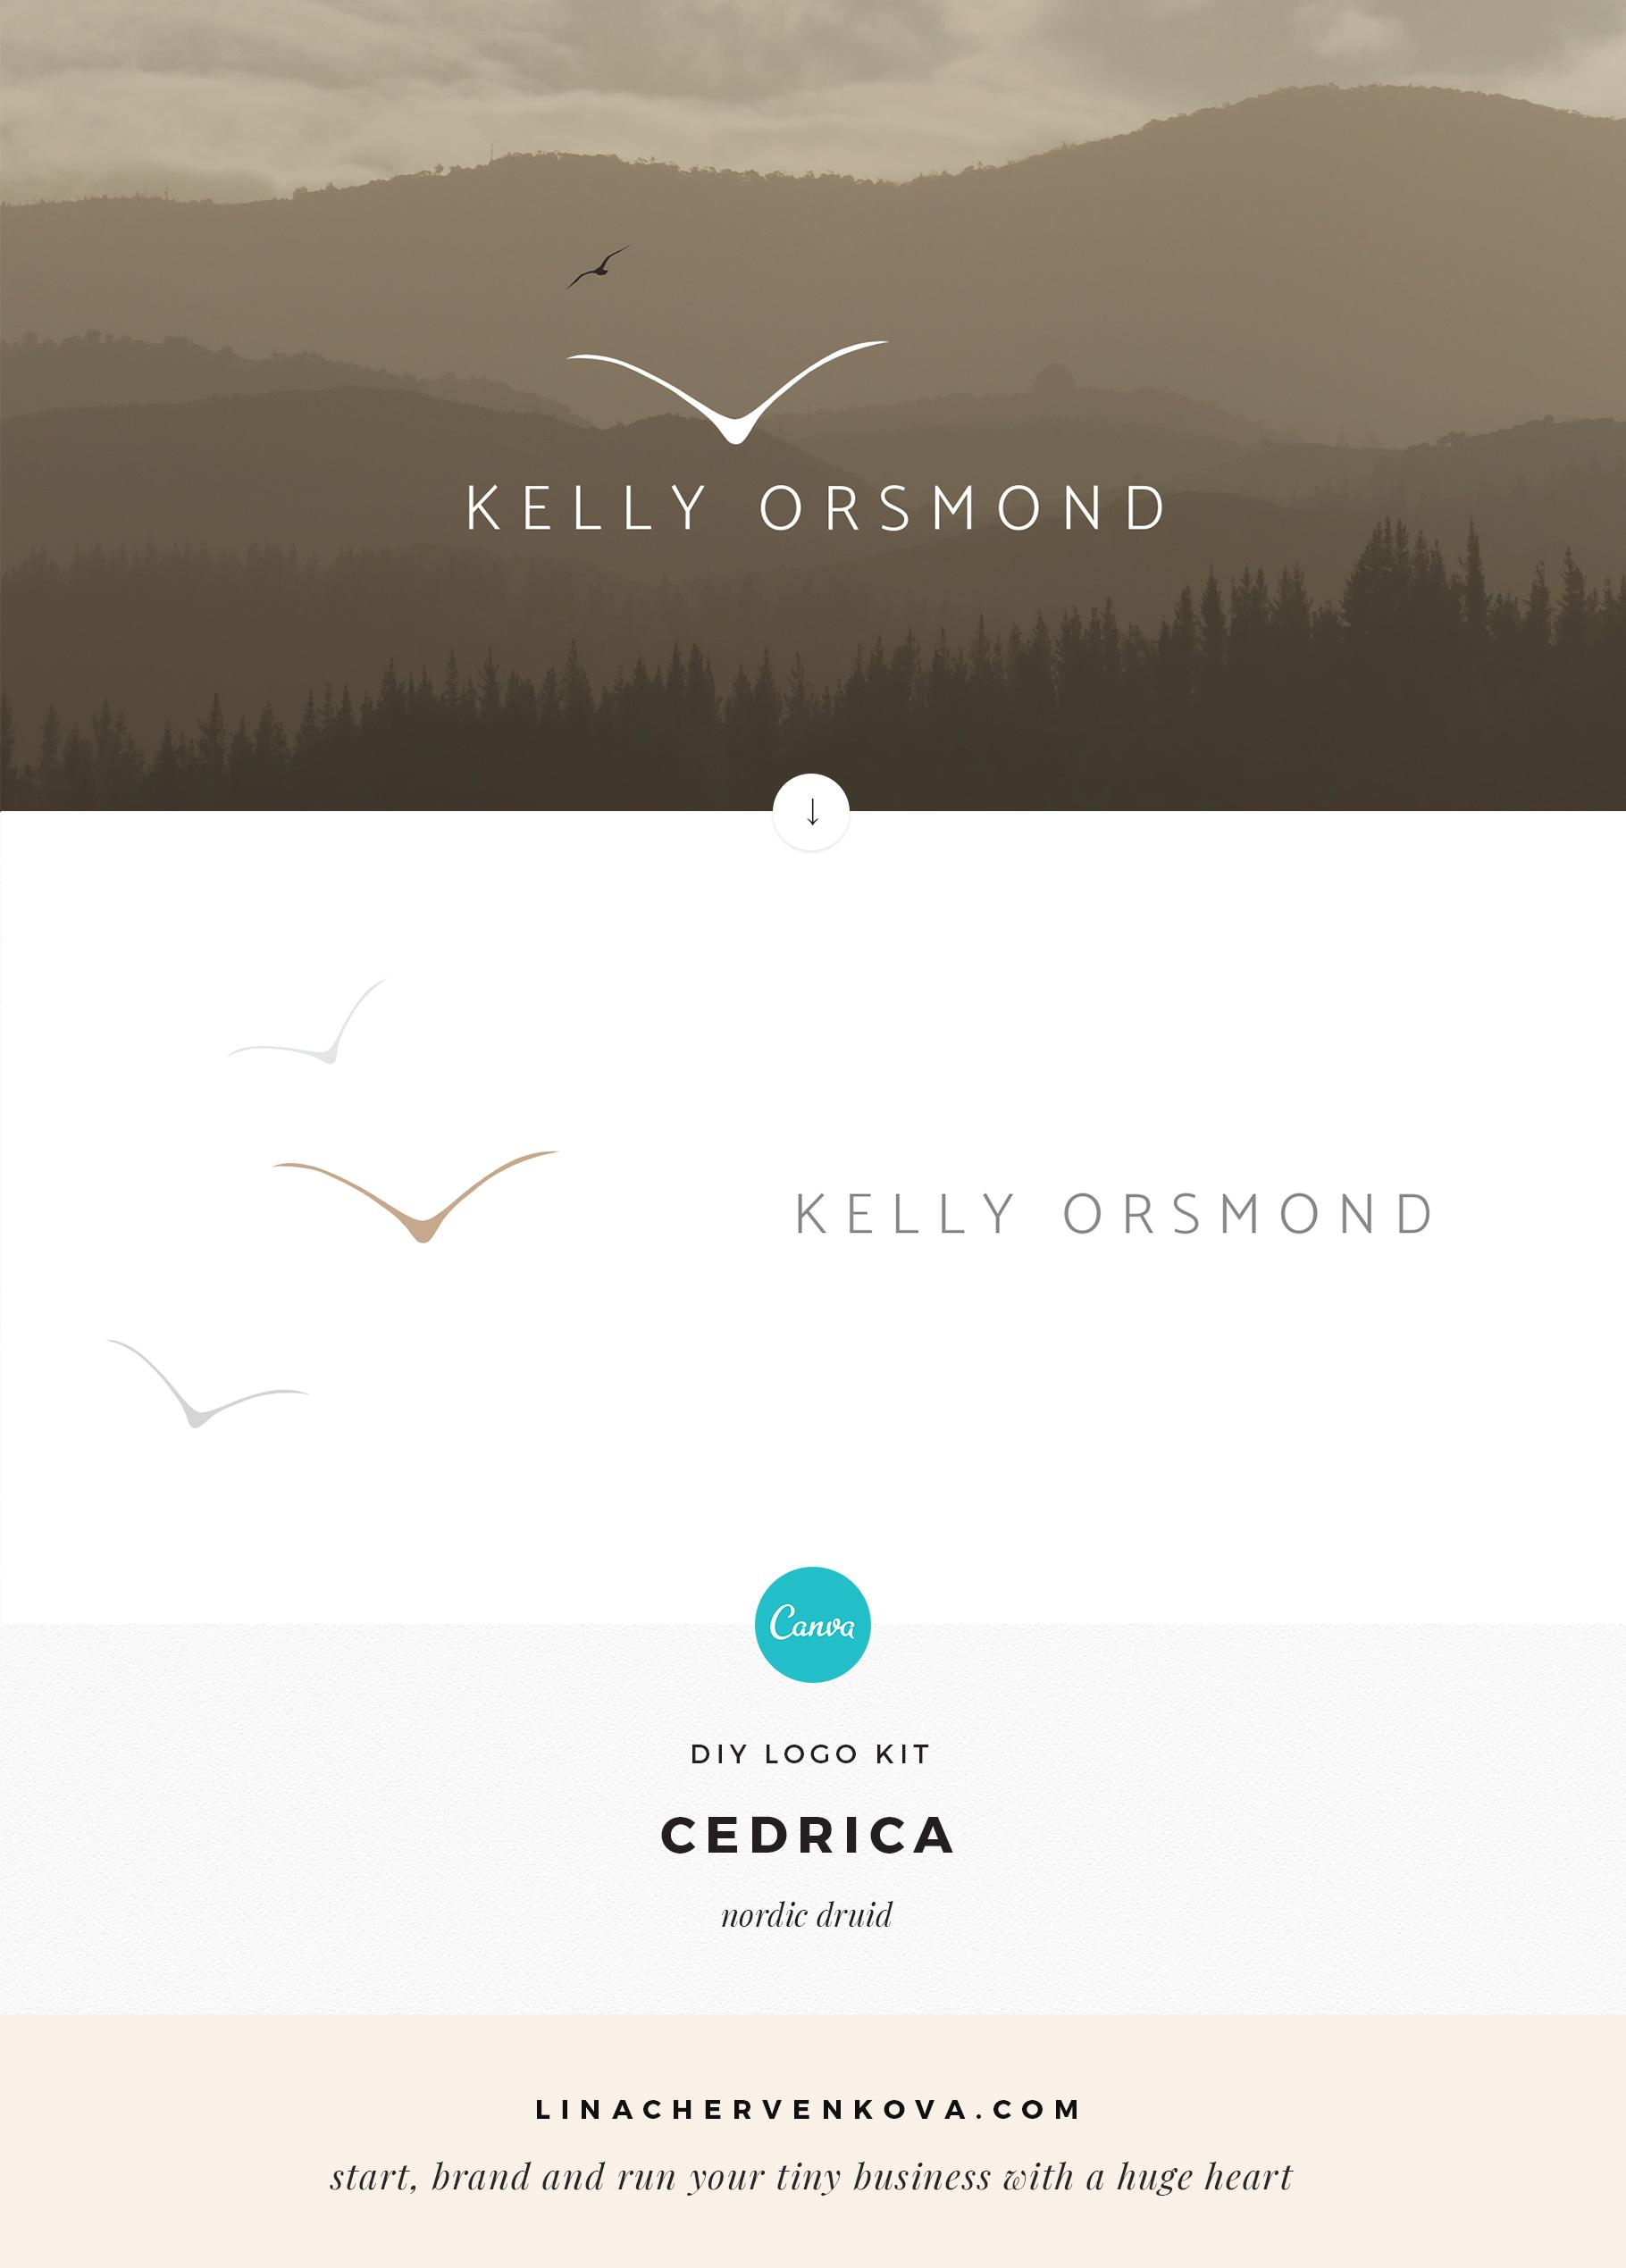 All the tools you need to design a simple and elegant logo yourself — 7 DIY Canva Logo Kits | linachervenkova.com/logokits